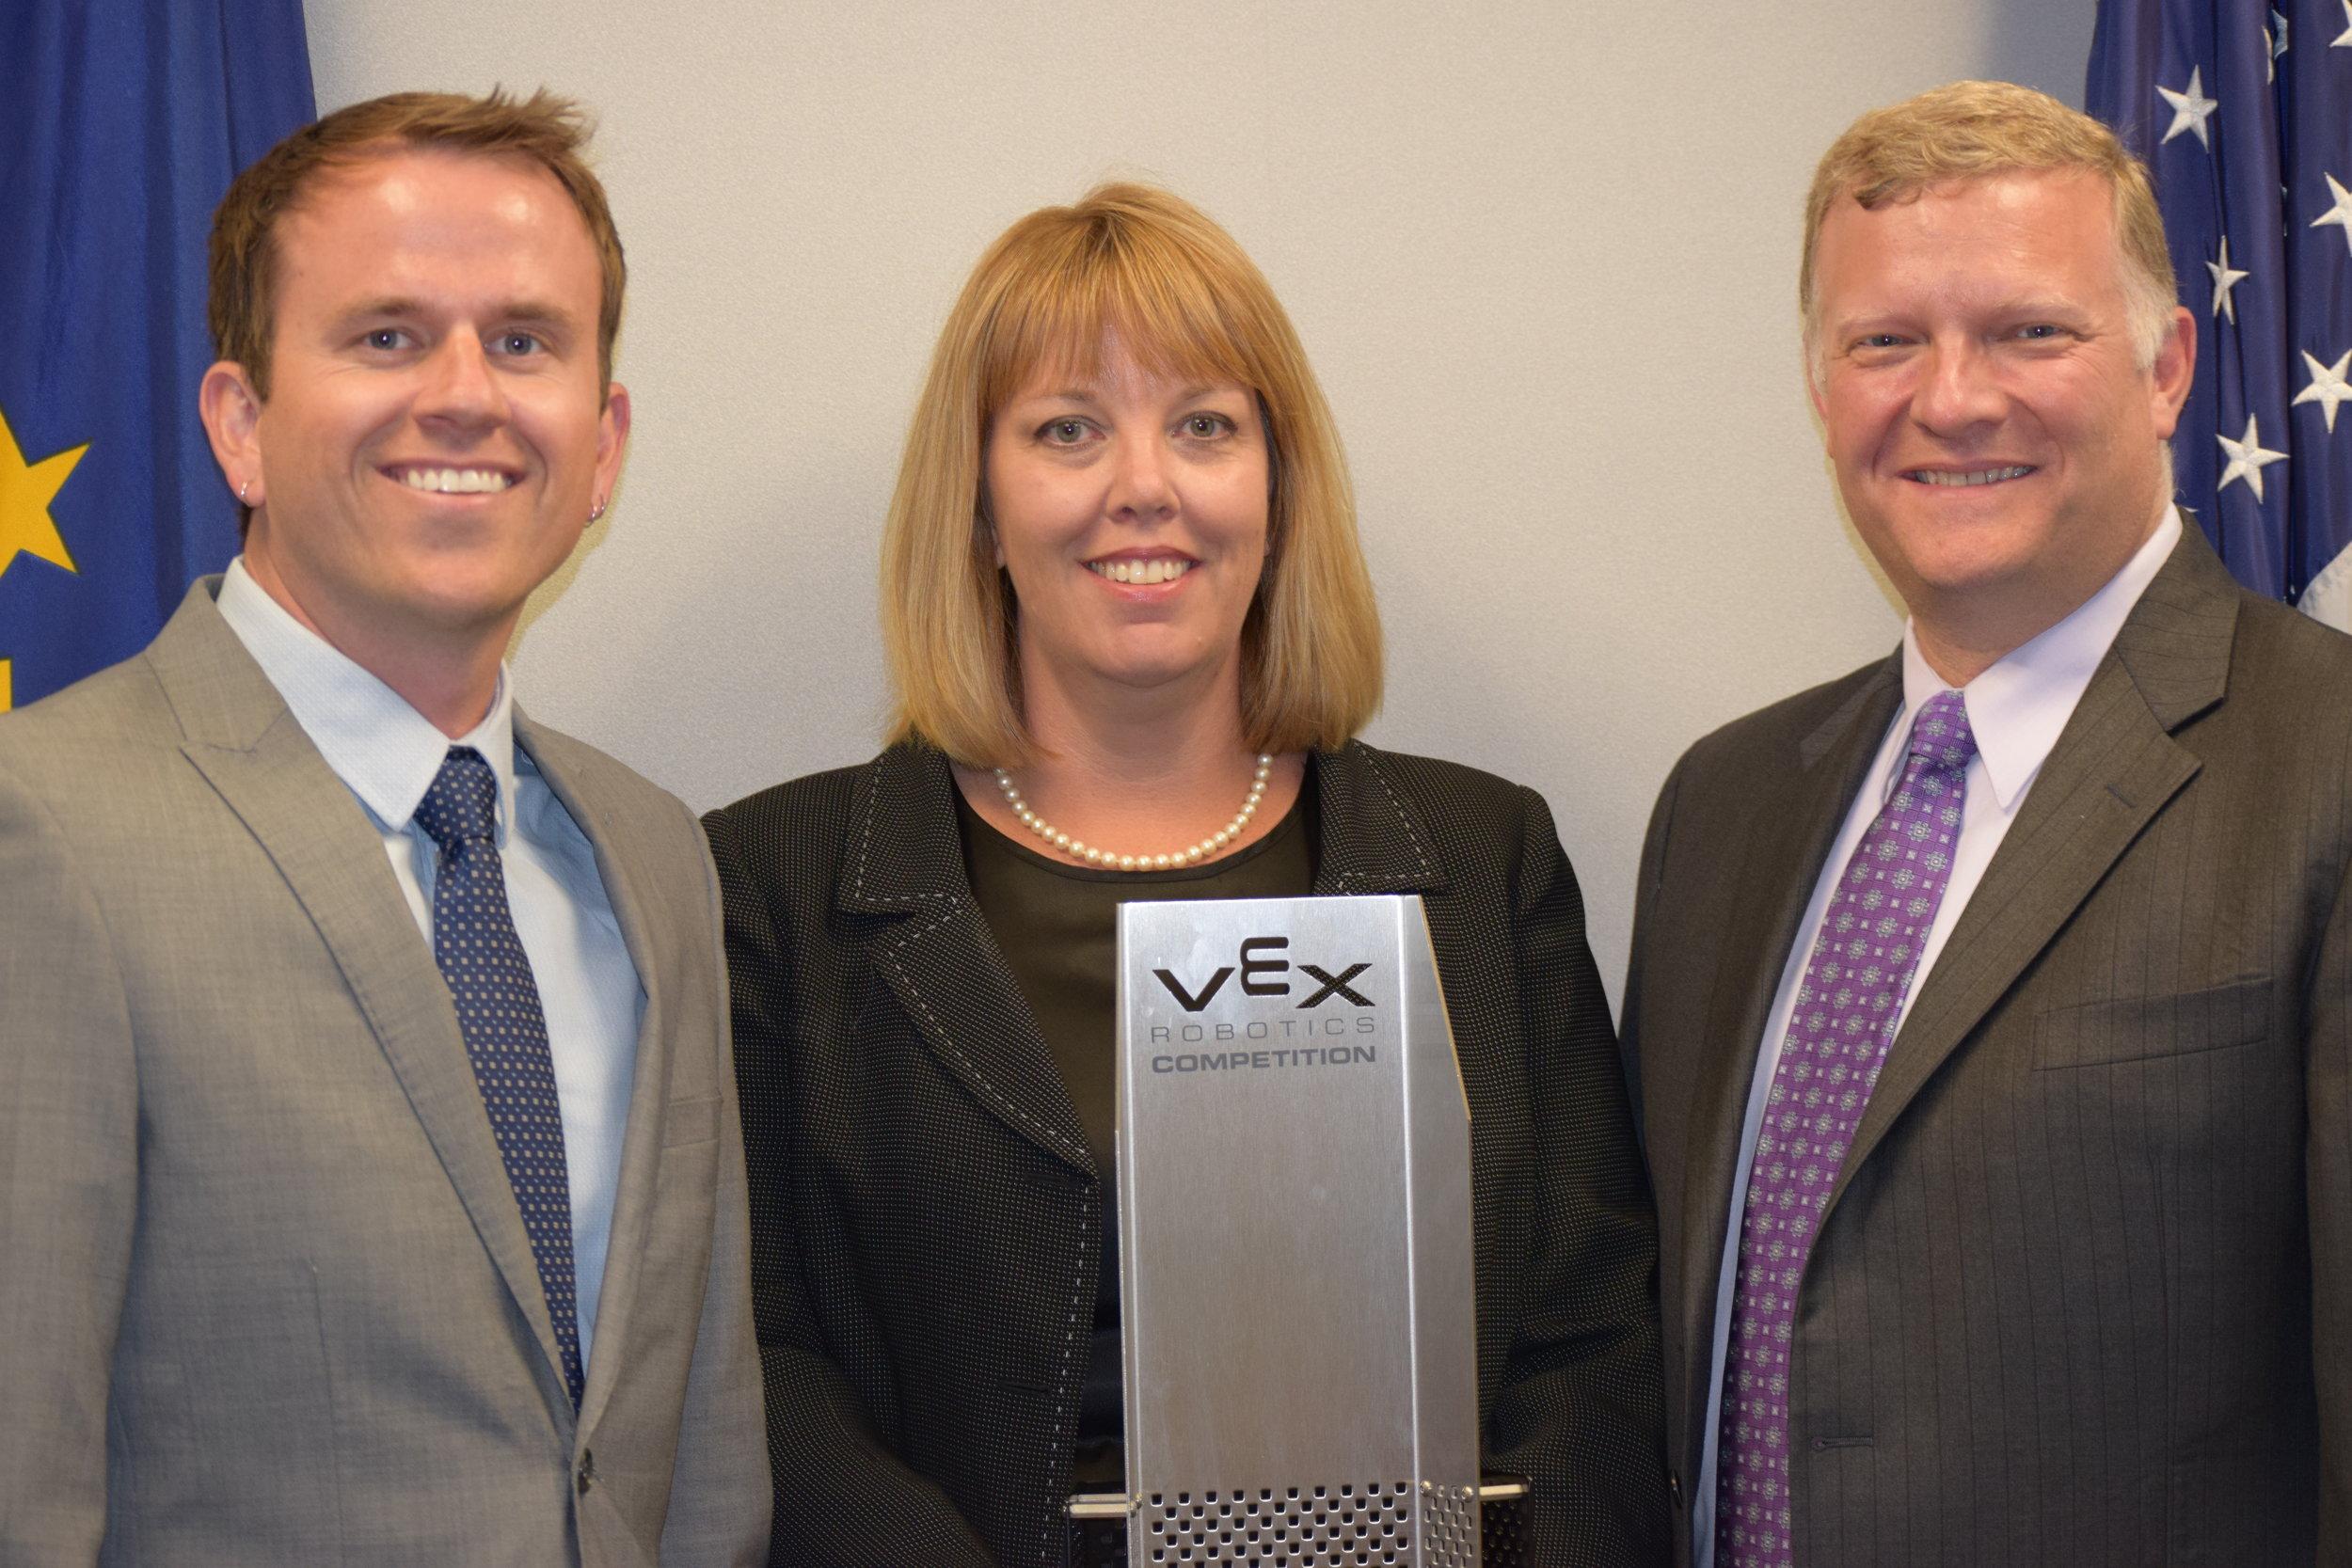 State Director of Robotics George Giltner, TPF4Y Executive Director Laura Dodds, and former DWD Associate COO, Dennis Wimer